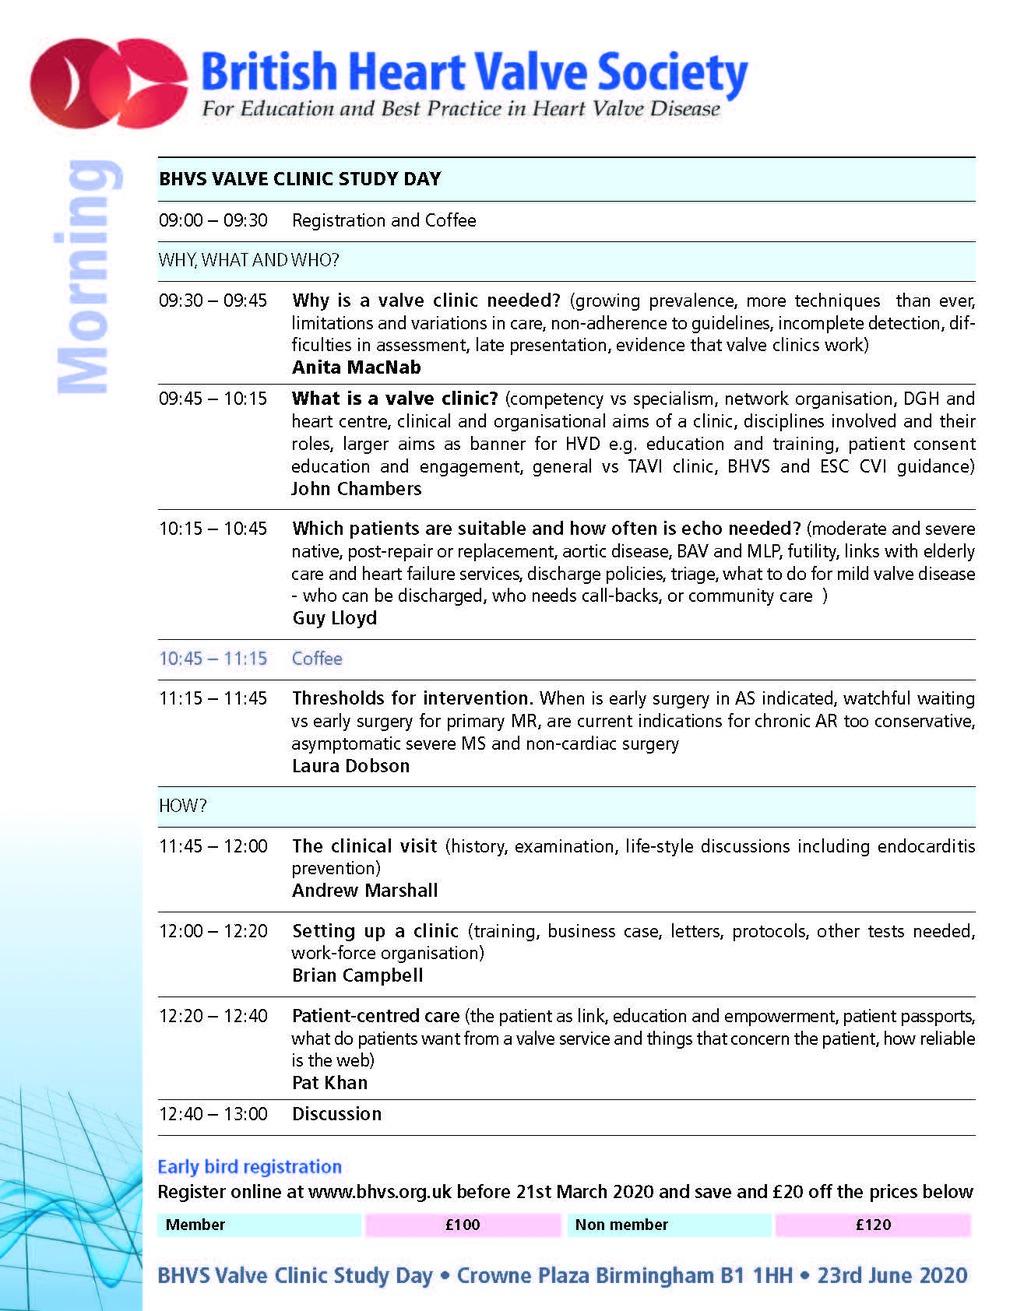 British Heart Valve Society (BHVS) - Clinic Study Day